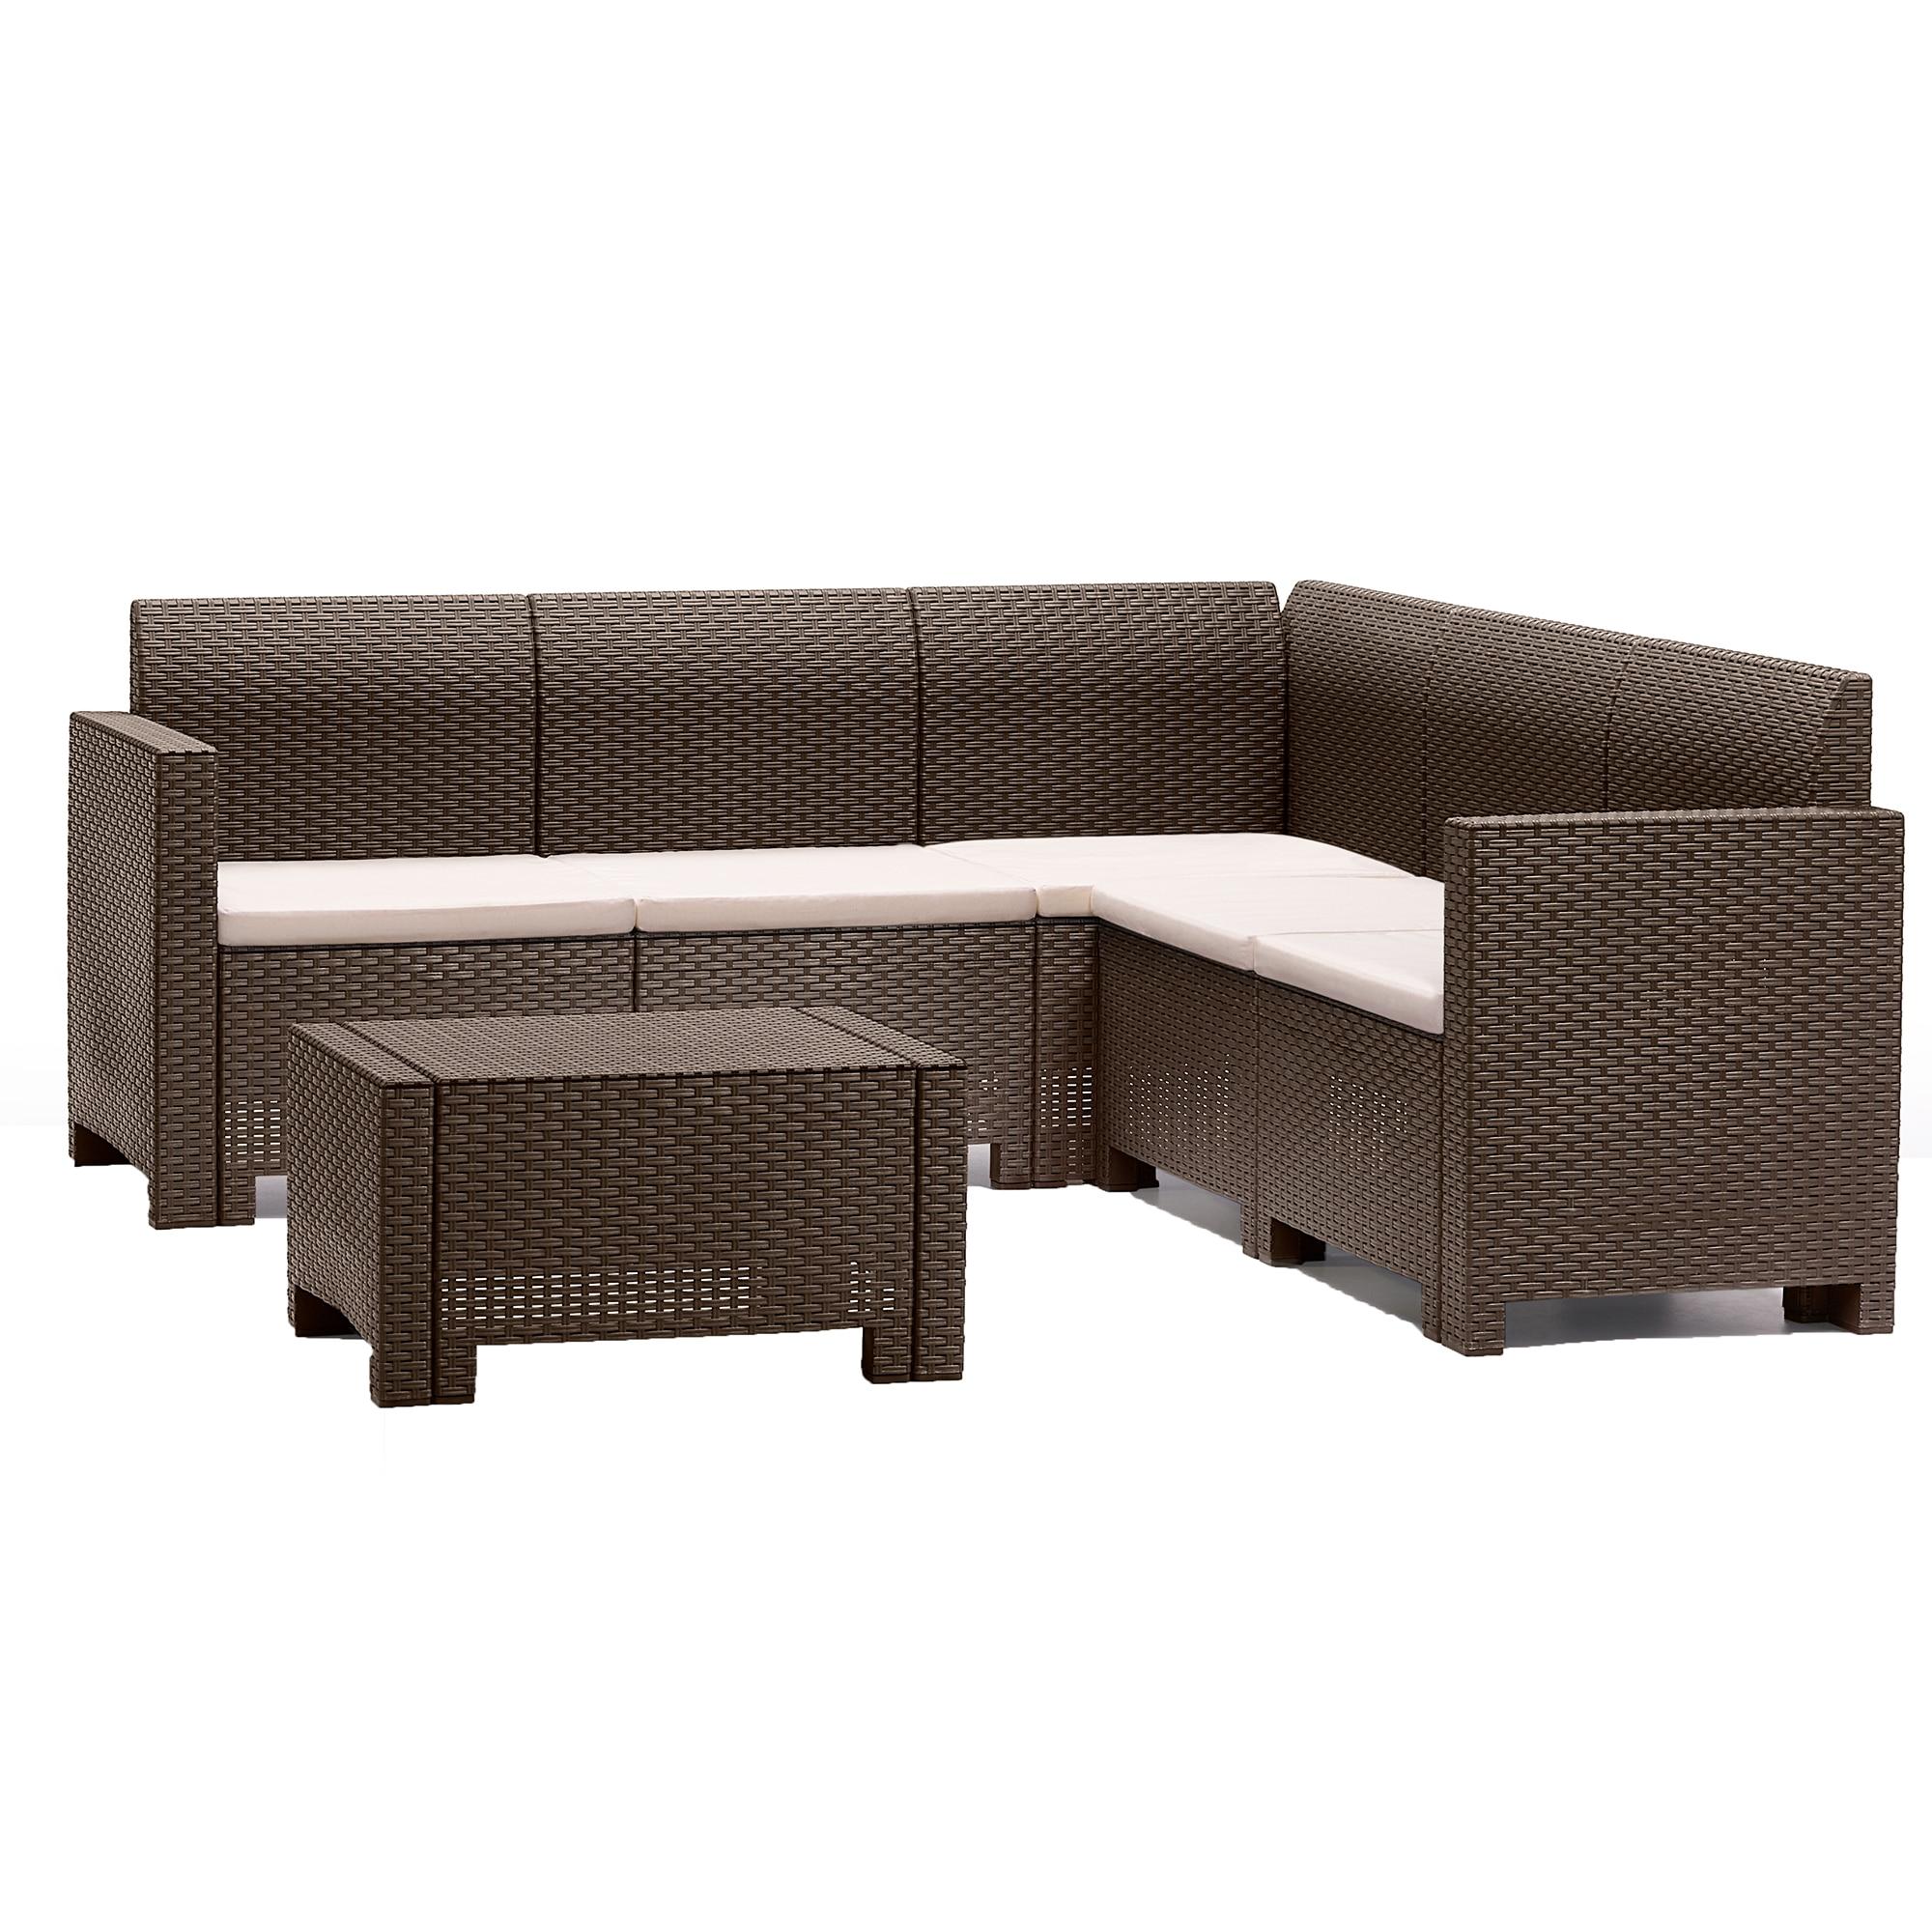 Fotografie Set mobilier gradina/terasa Nebraska, coltar 5 locuri + masuta, perne incluse, maro